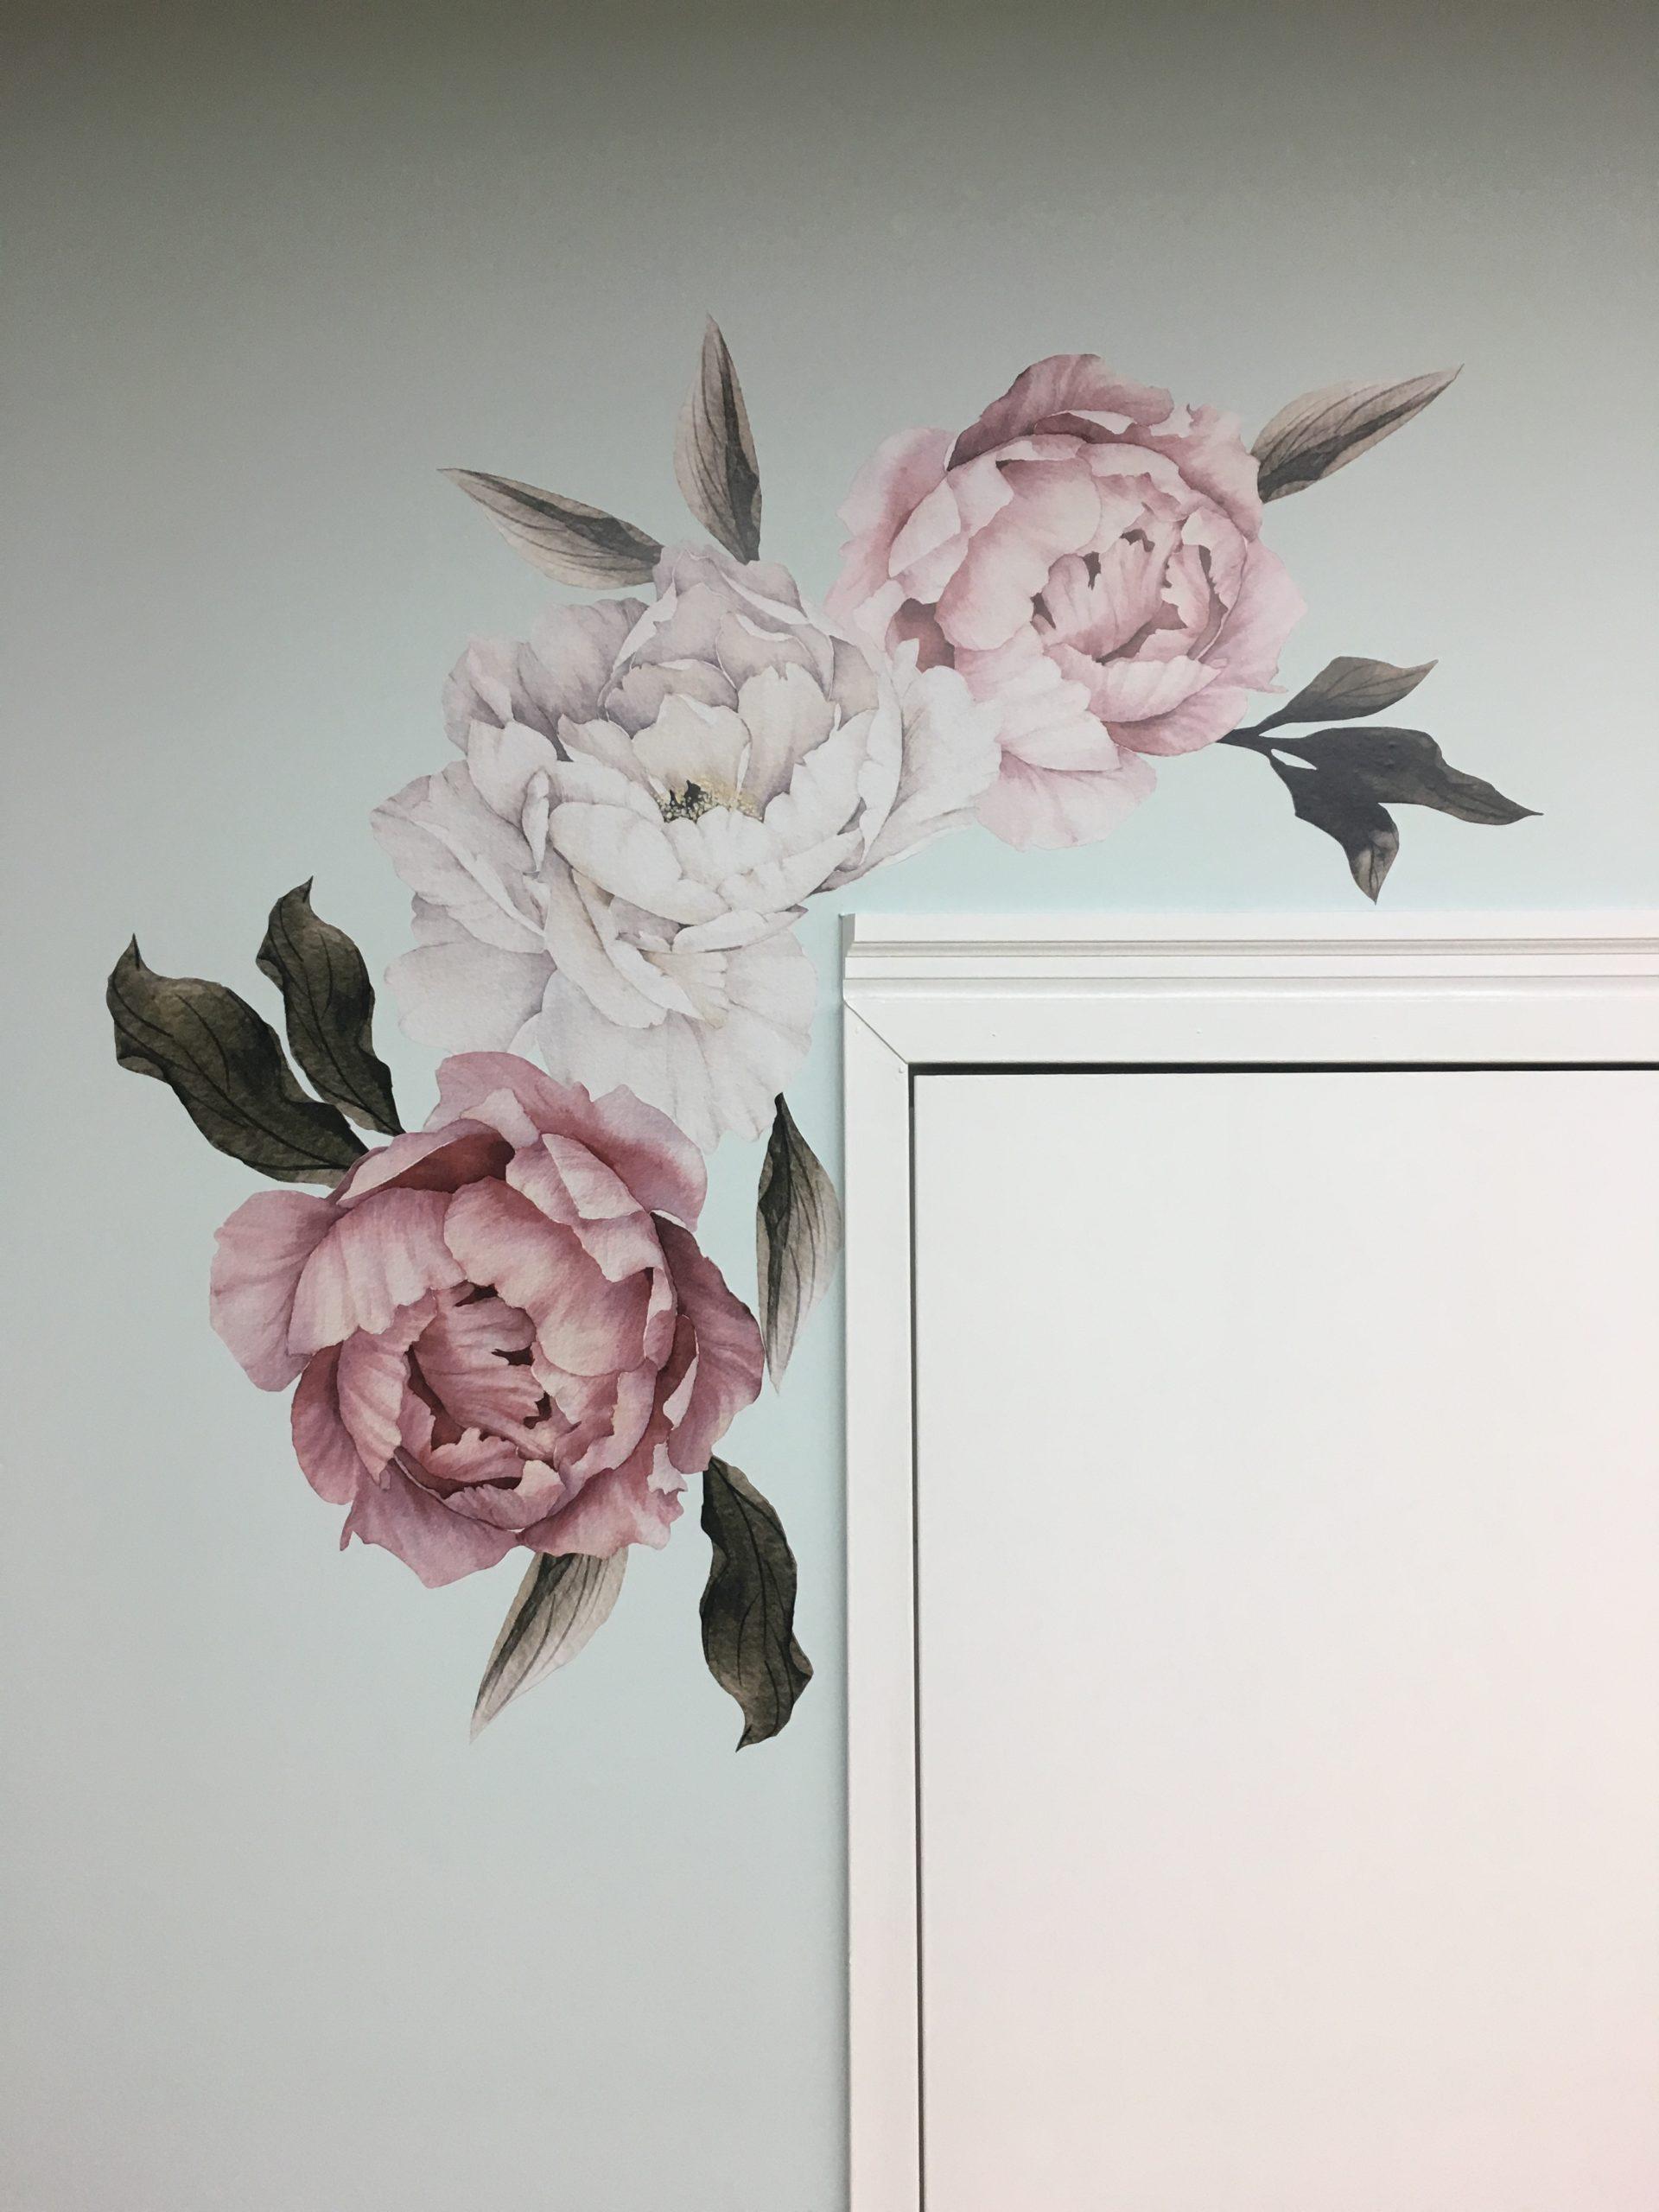 floral decal around doorway